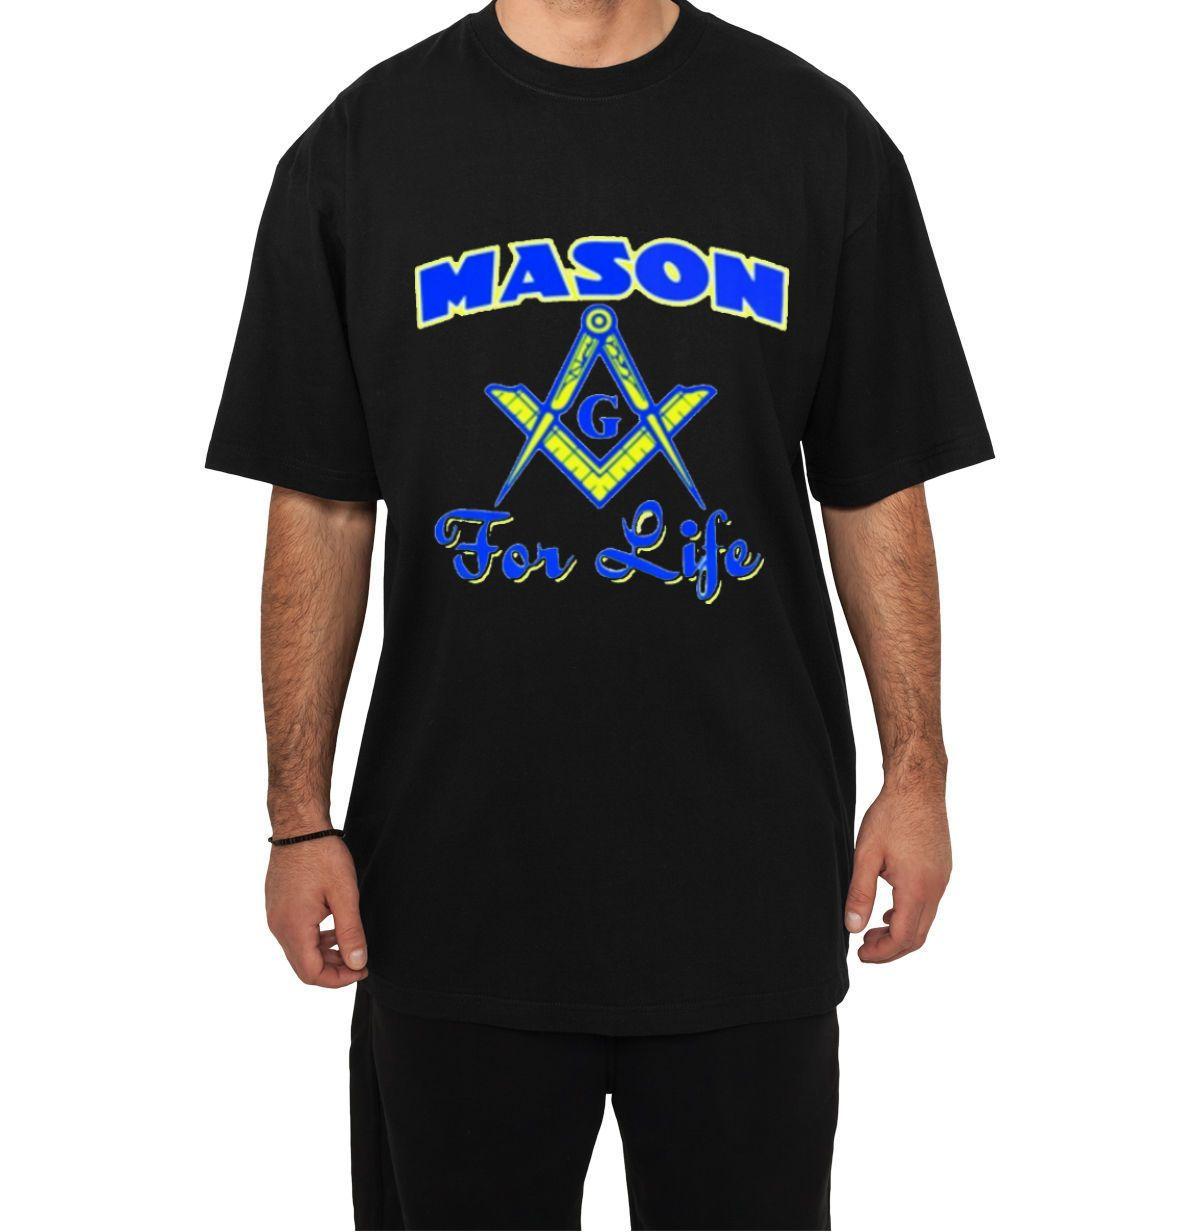 Masonic mason for life black t shirt for Mason s men s shirts